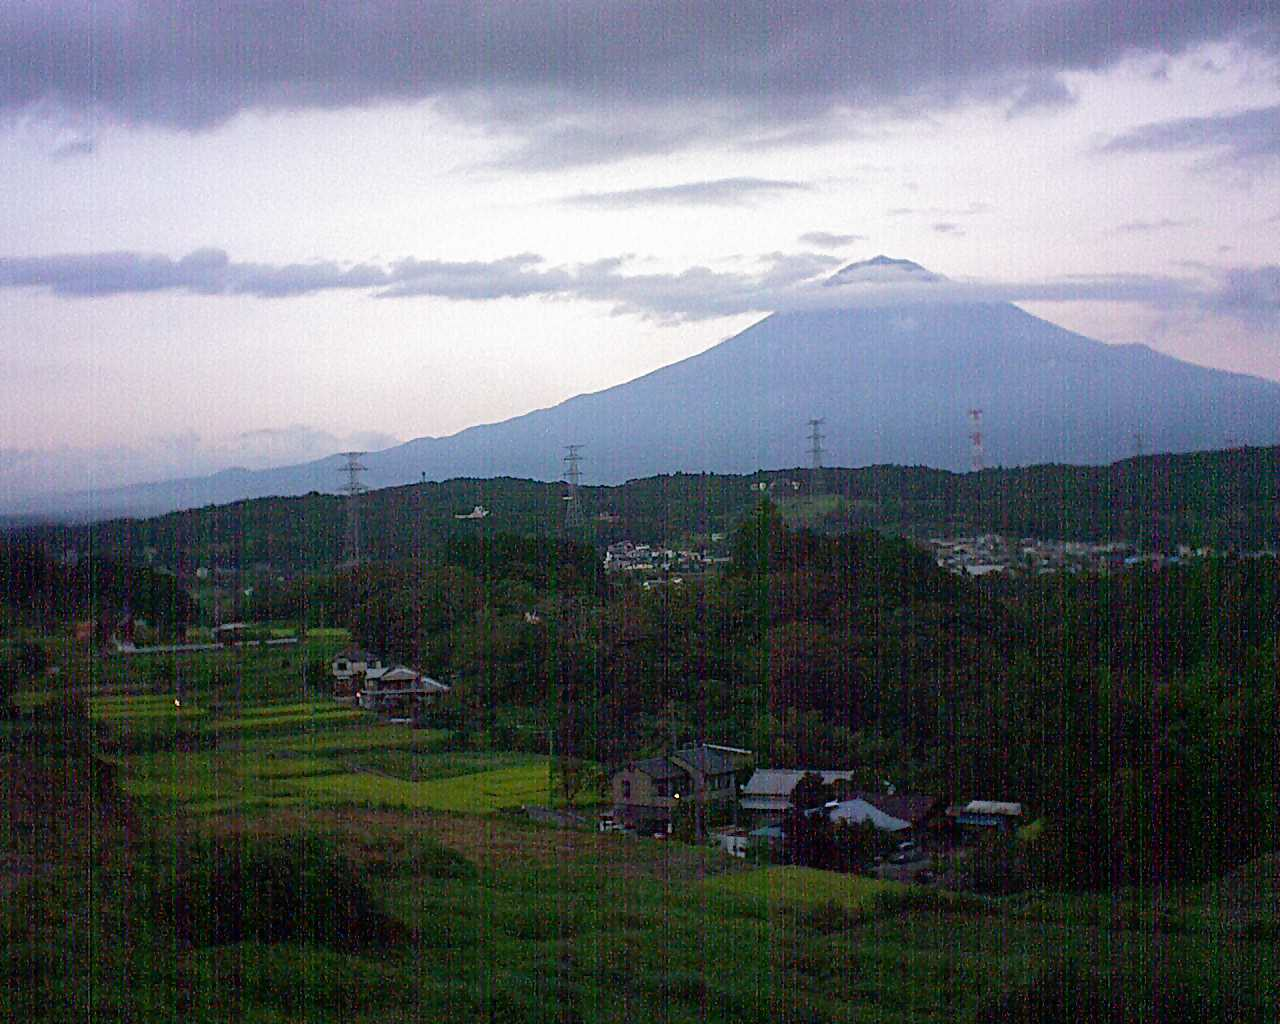 9月16日地震予想。